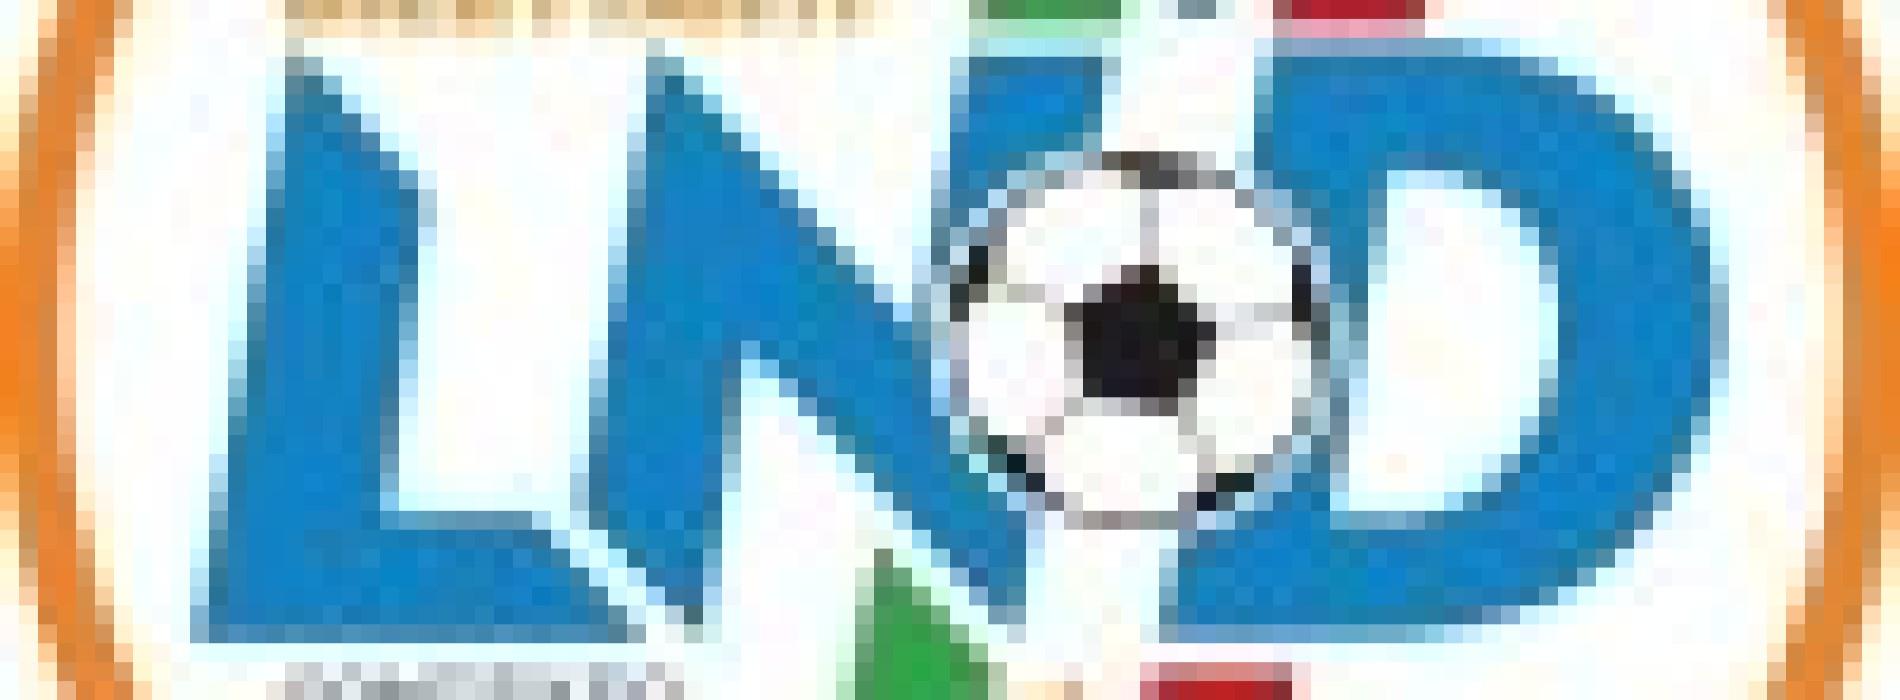 Rappresentative calcio a 11 CRB, i nuovi Commissari Tecnici